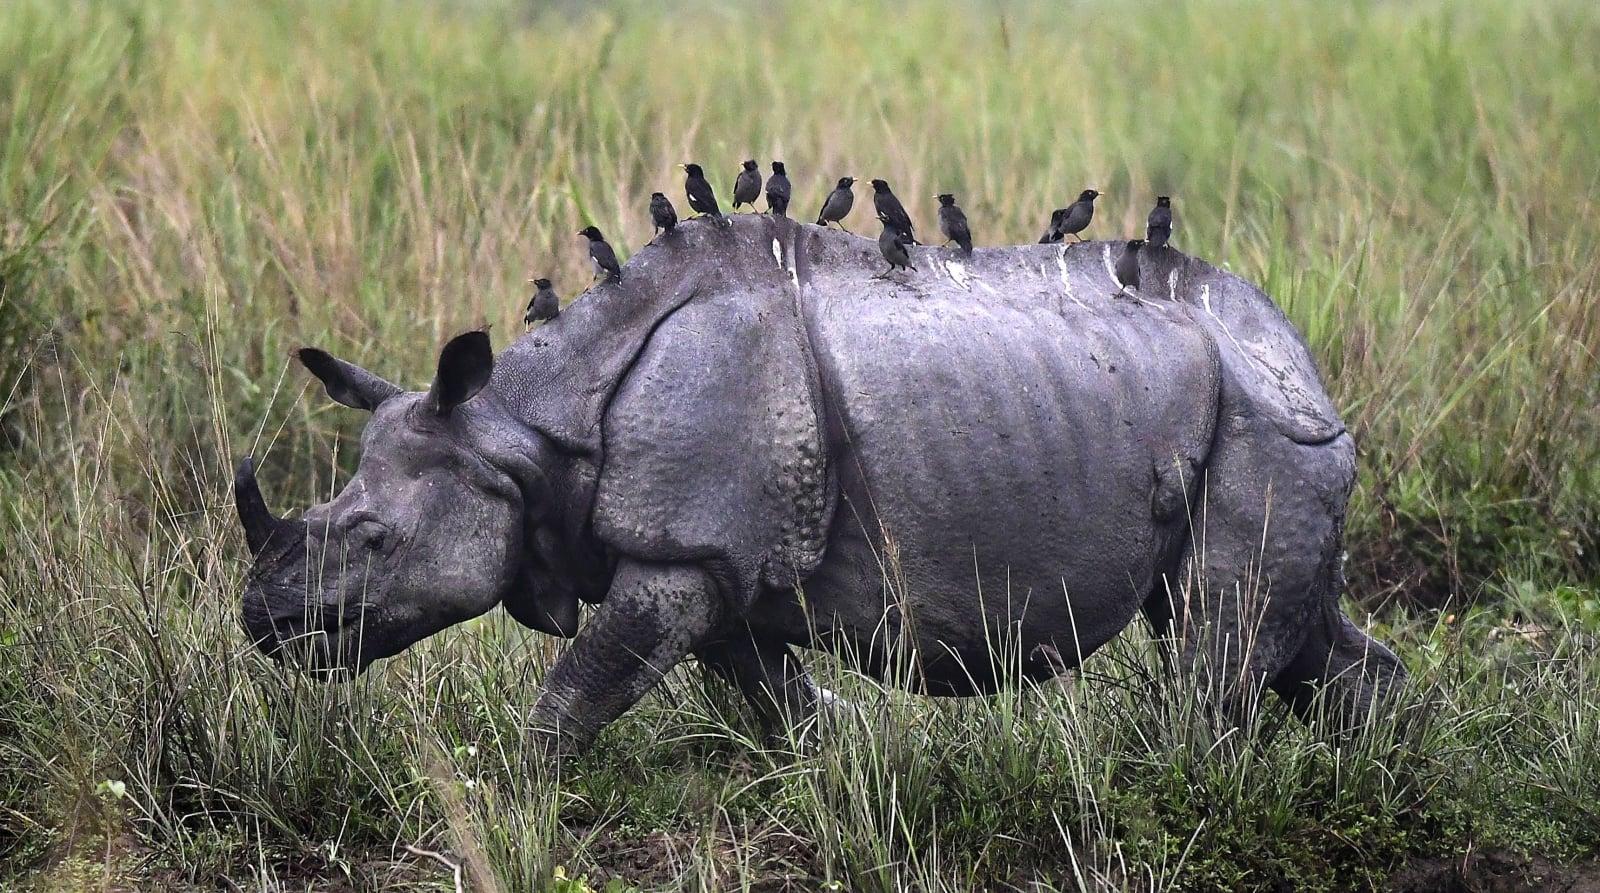 Nosorożec z Indii fot. EPA/STR